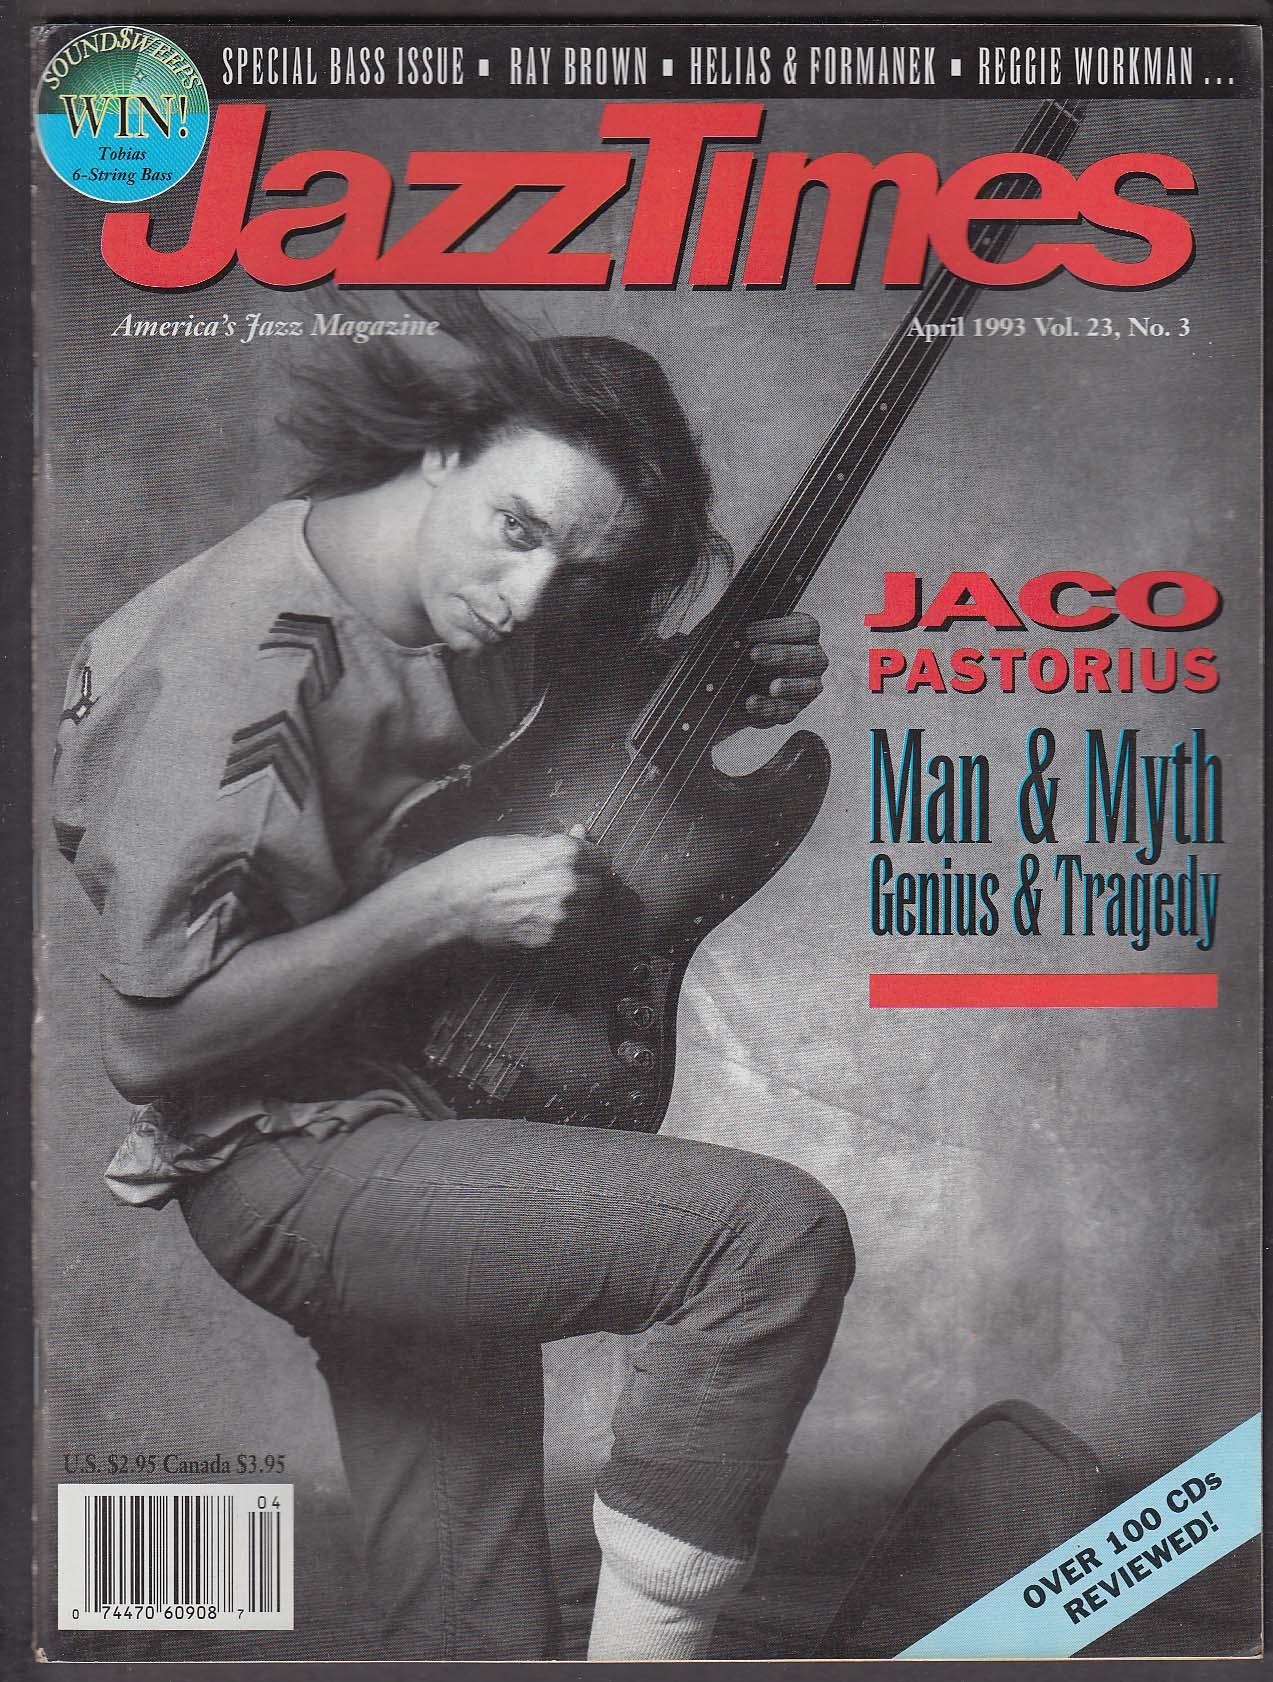 JAZZTIMES Jaco Pastorius Ray Brown Reggie Workman Helias & Formanek ++ 4 1993